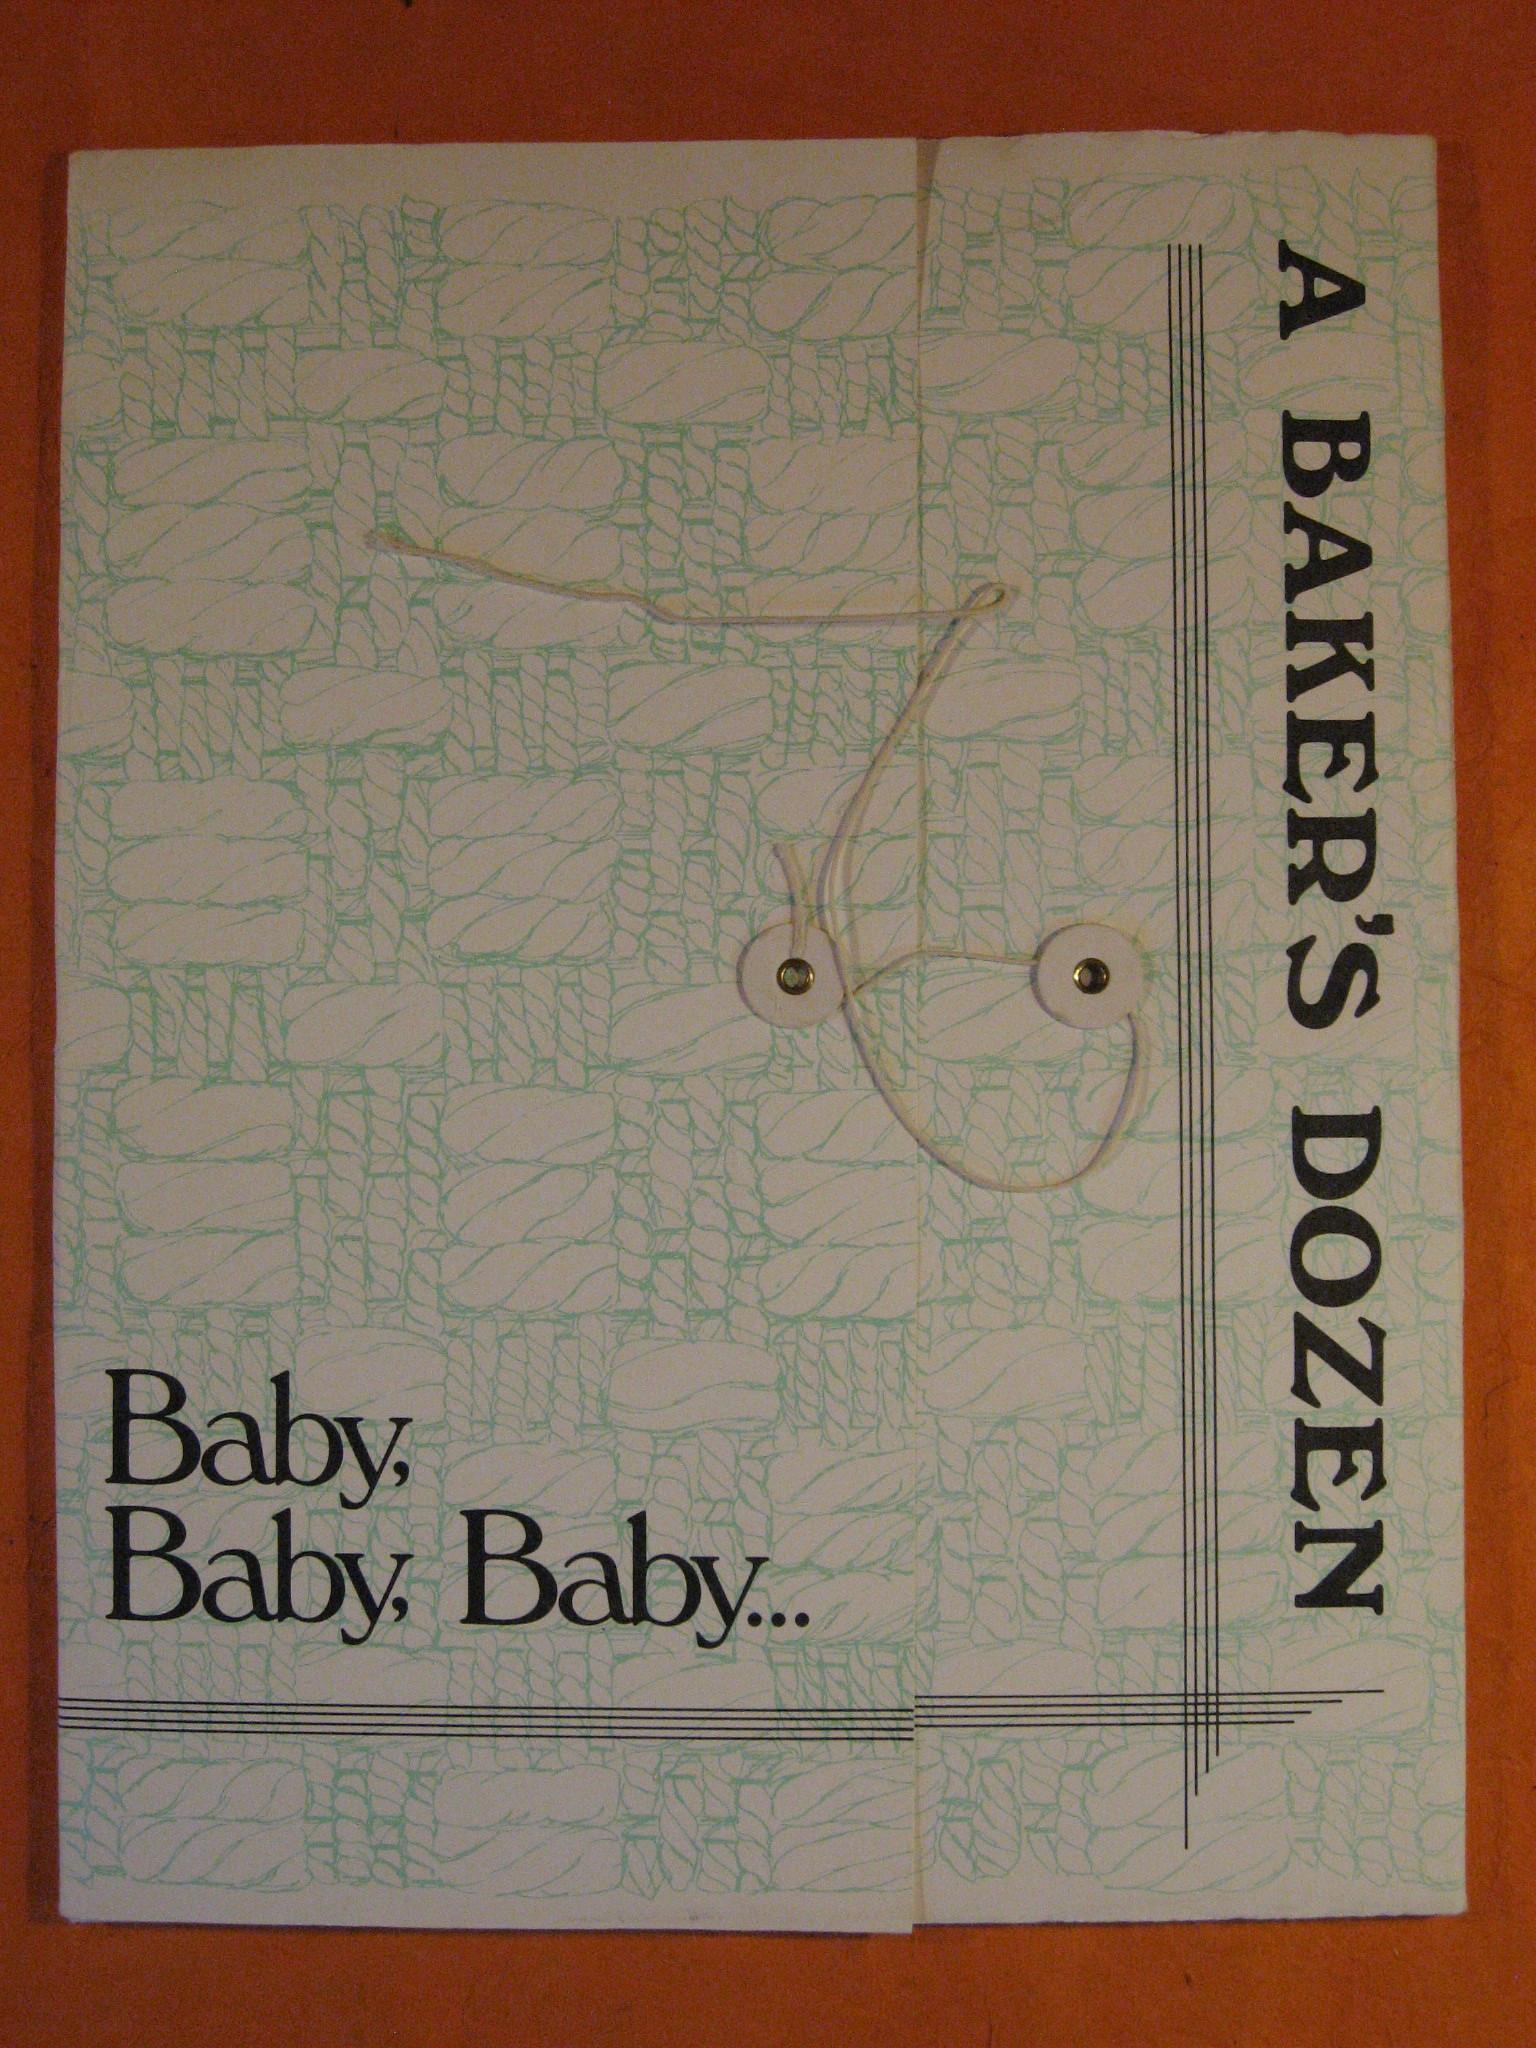 A Baker's Dozen:  Baby, Baby, Baby